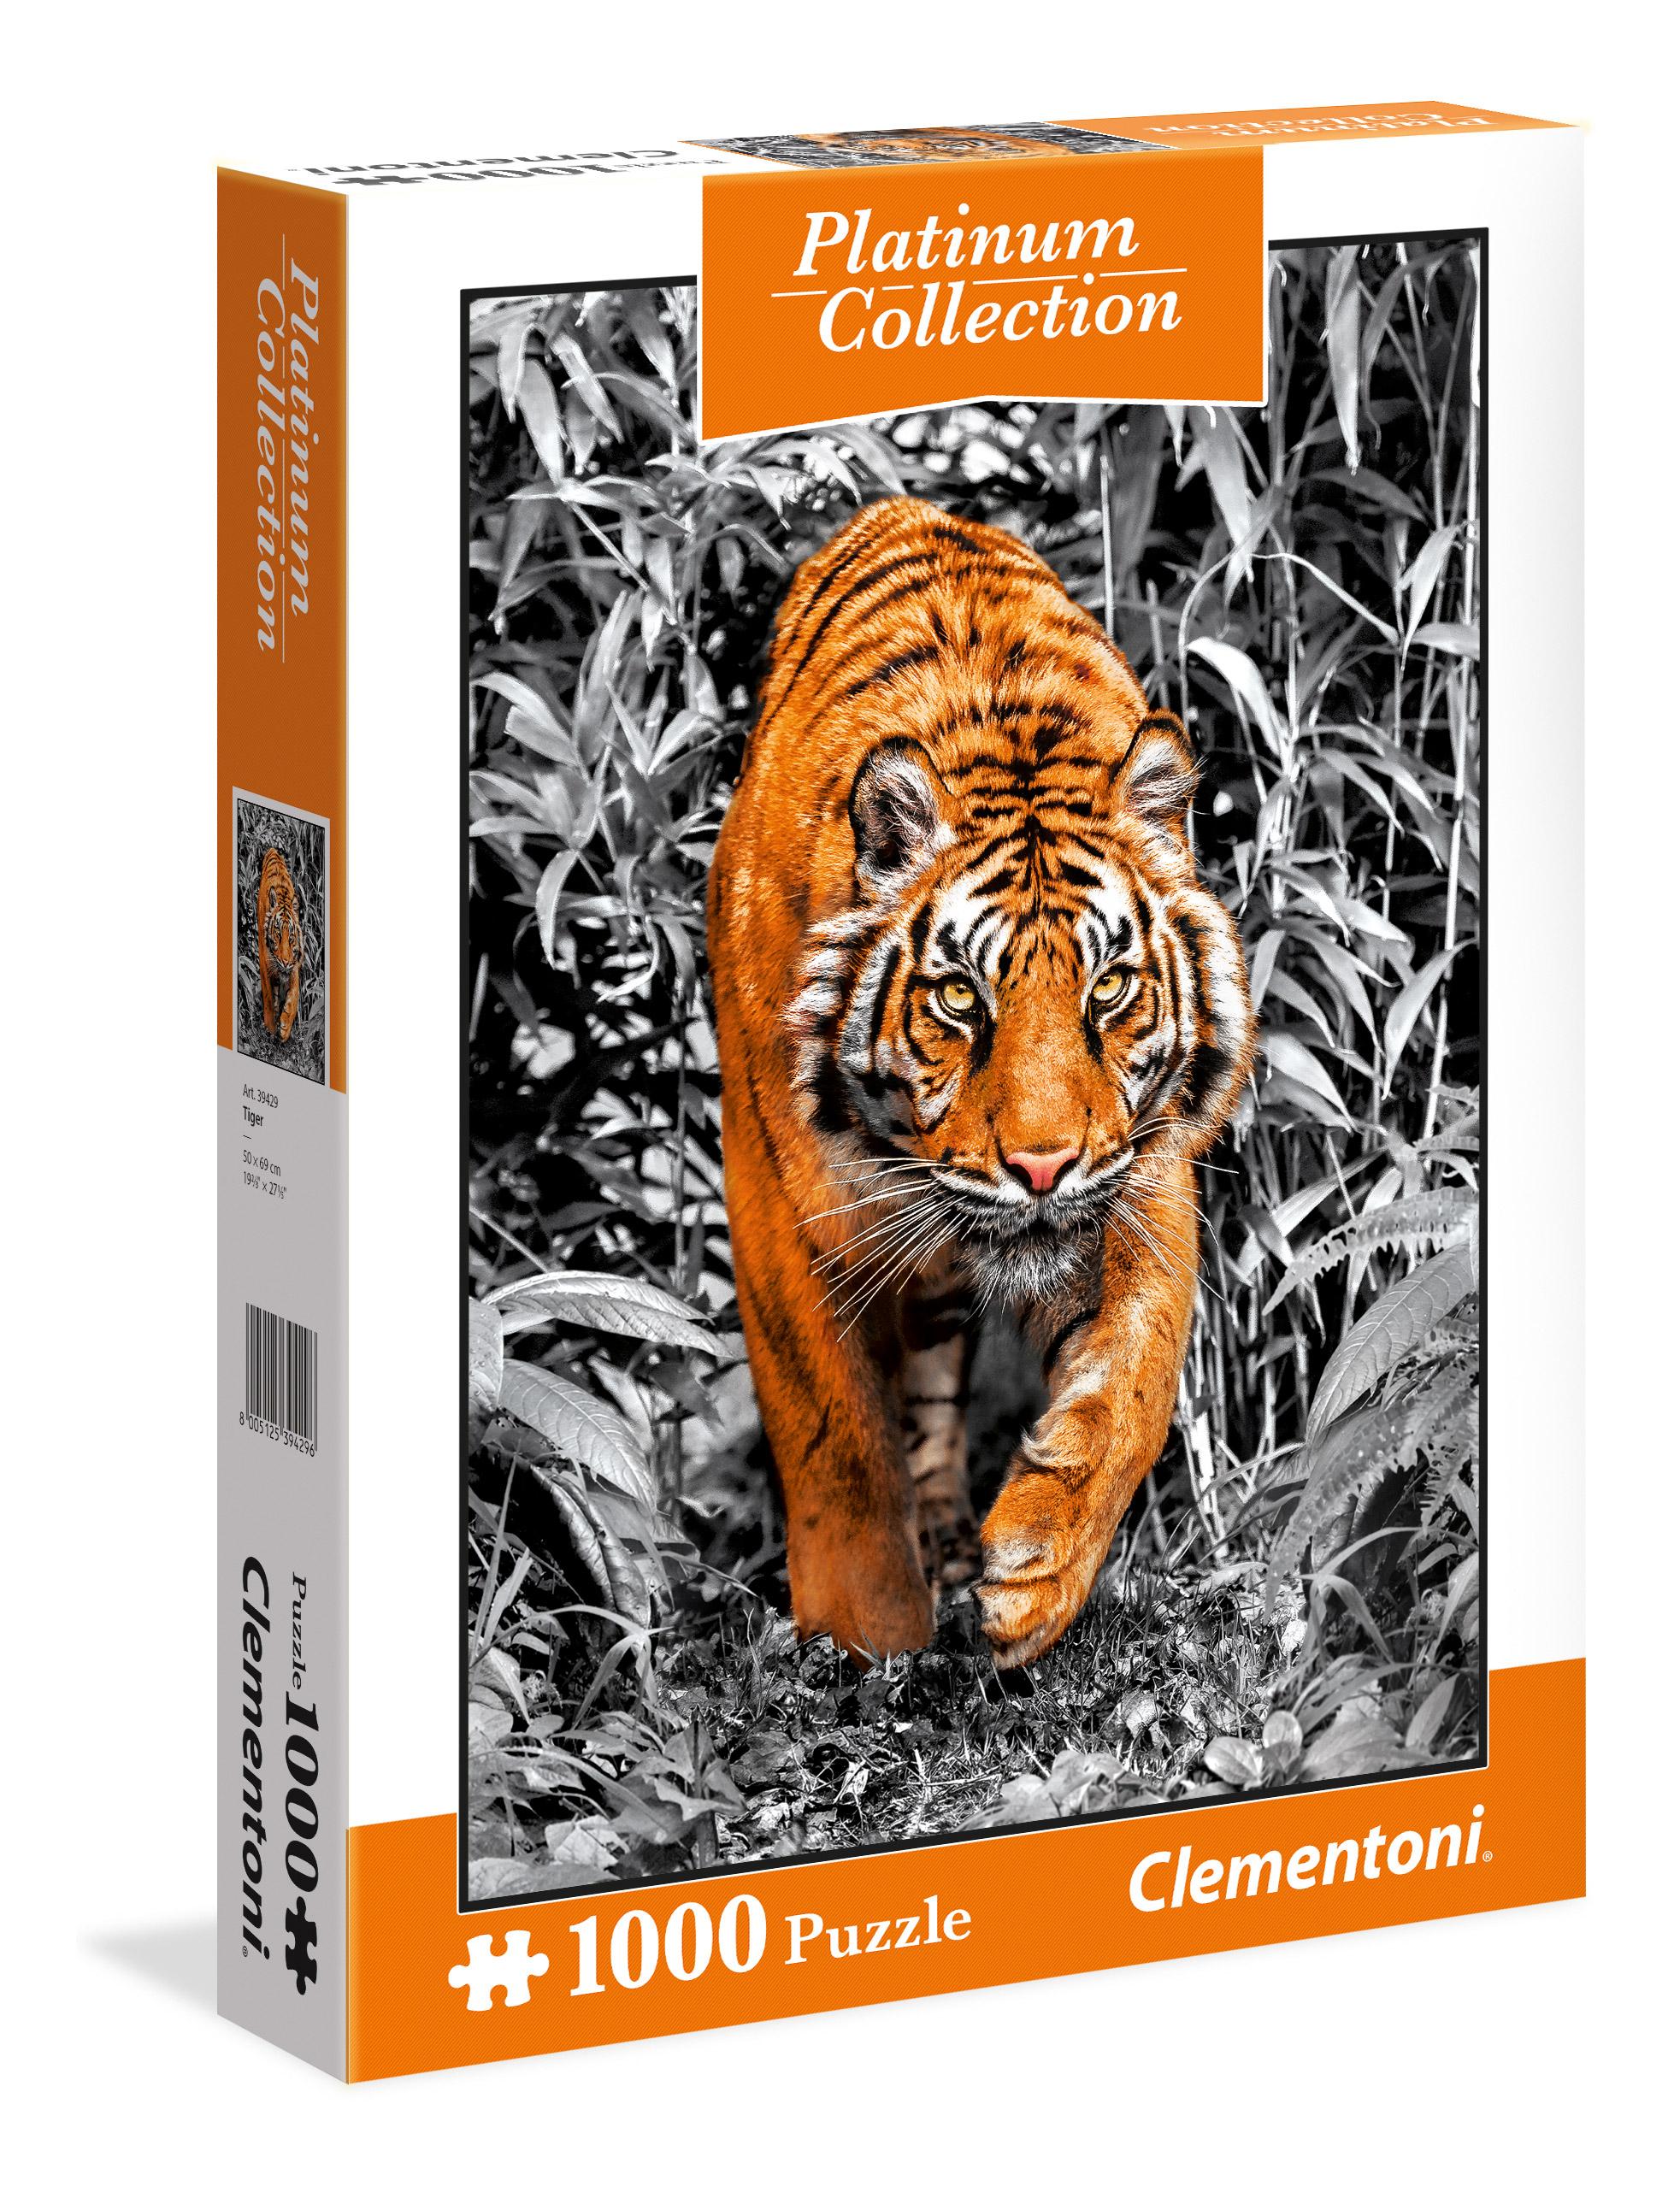 CLem.Пазл. 1000эл. Платиновая коллекция.39429 Тигр